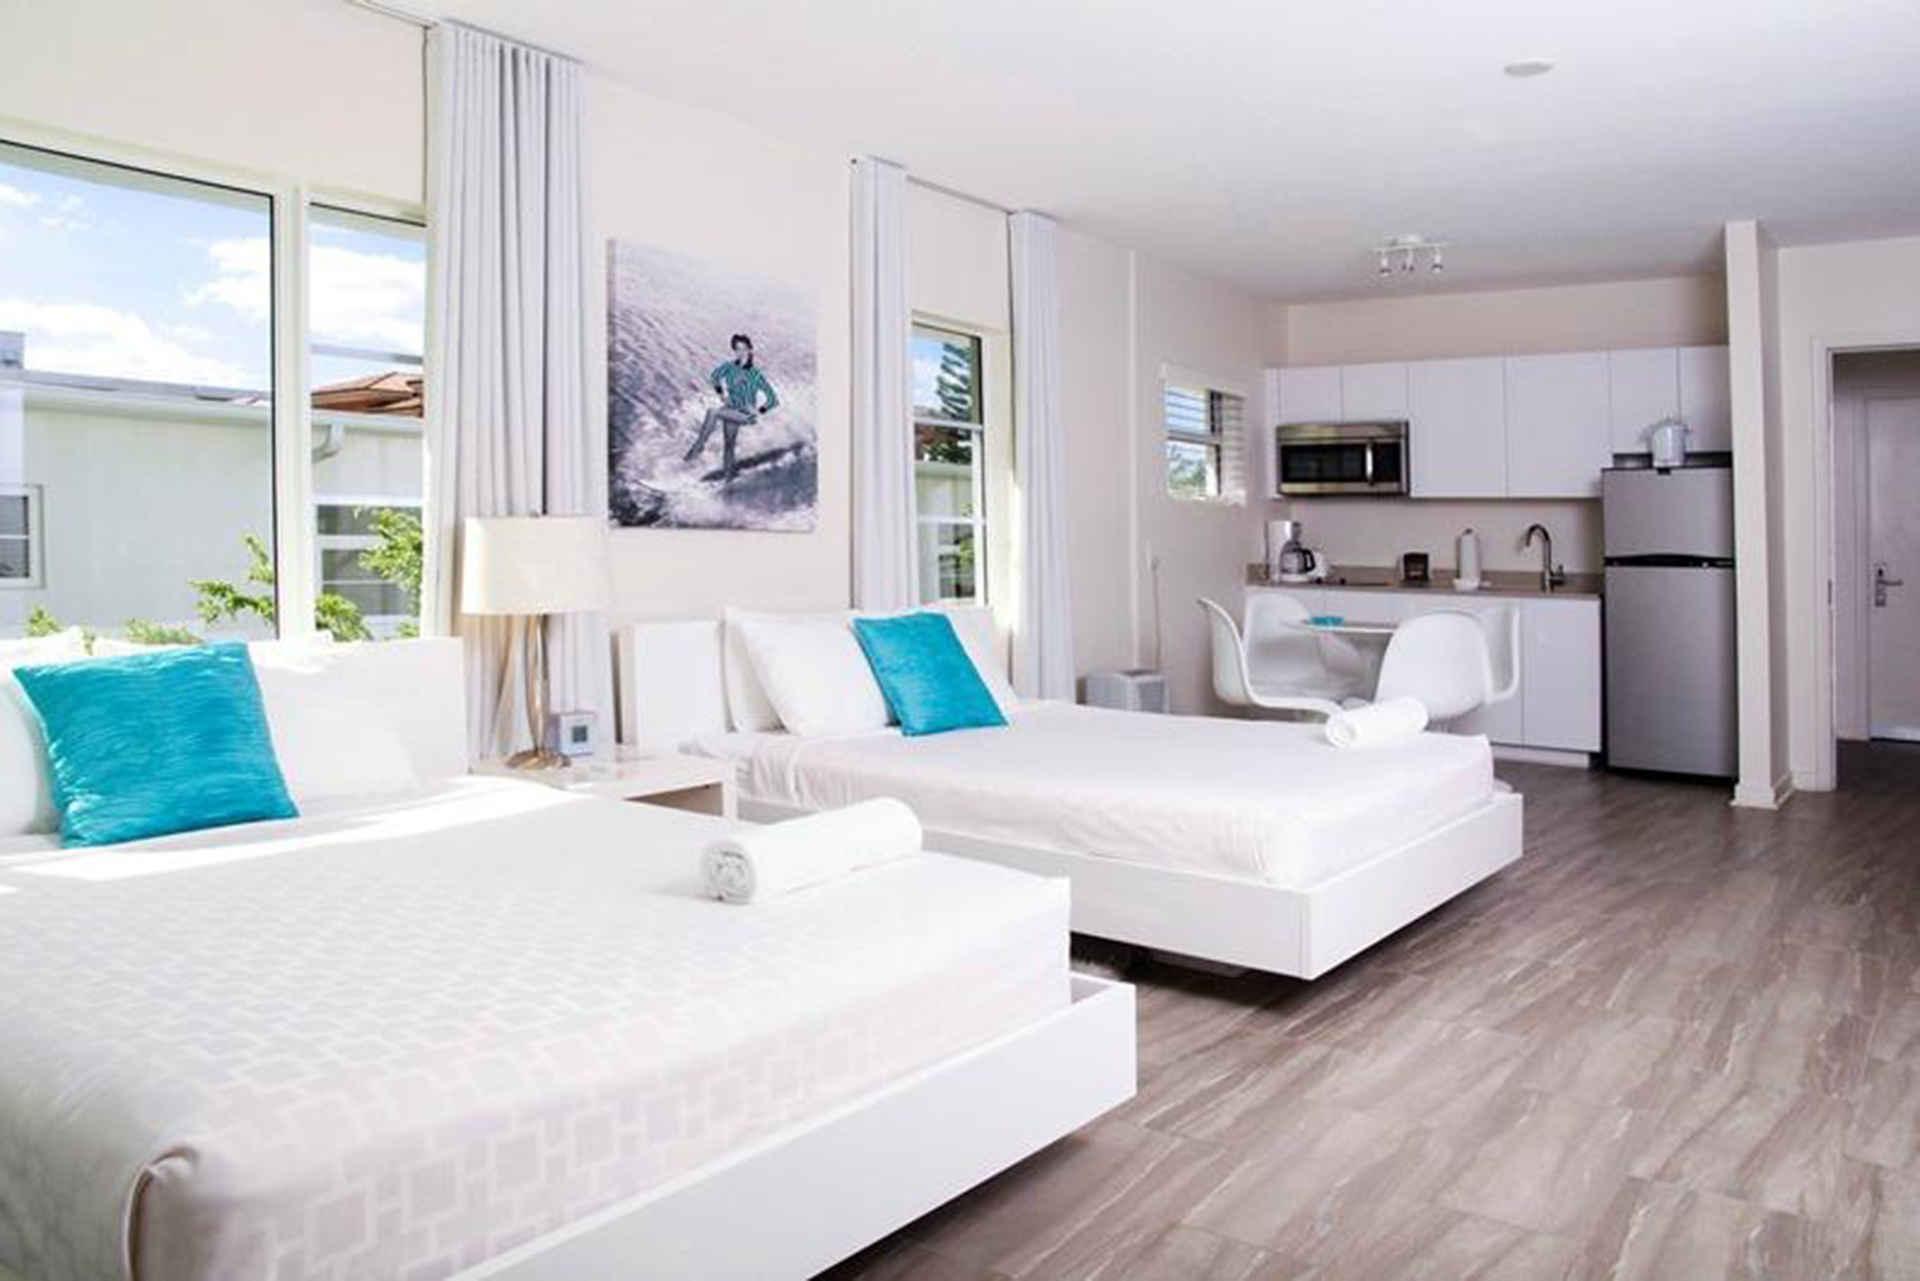 The Aqua Hotel in Fort Lauderdale